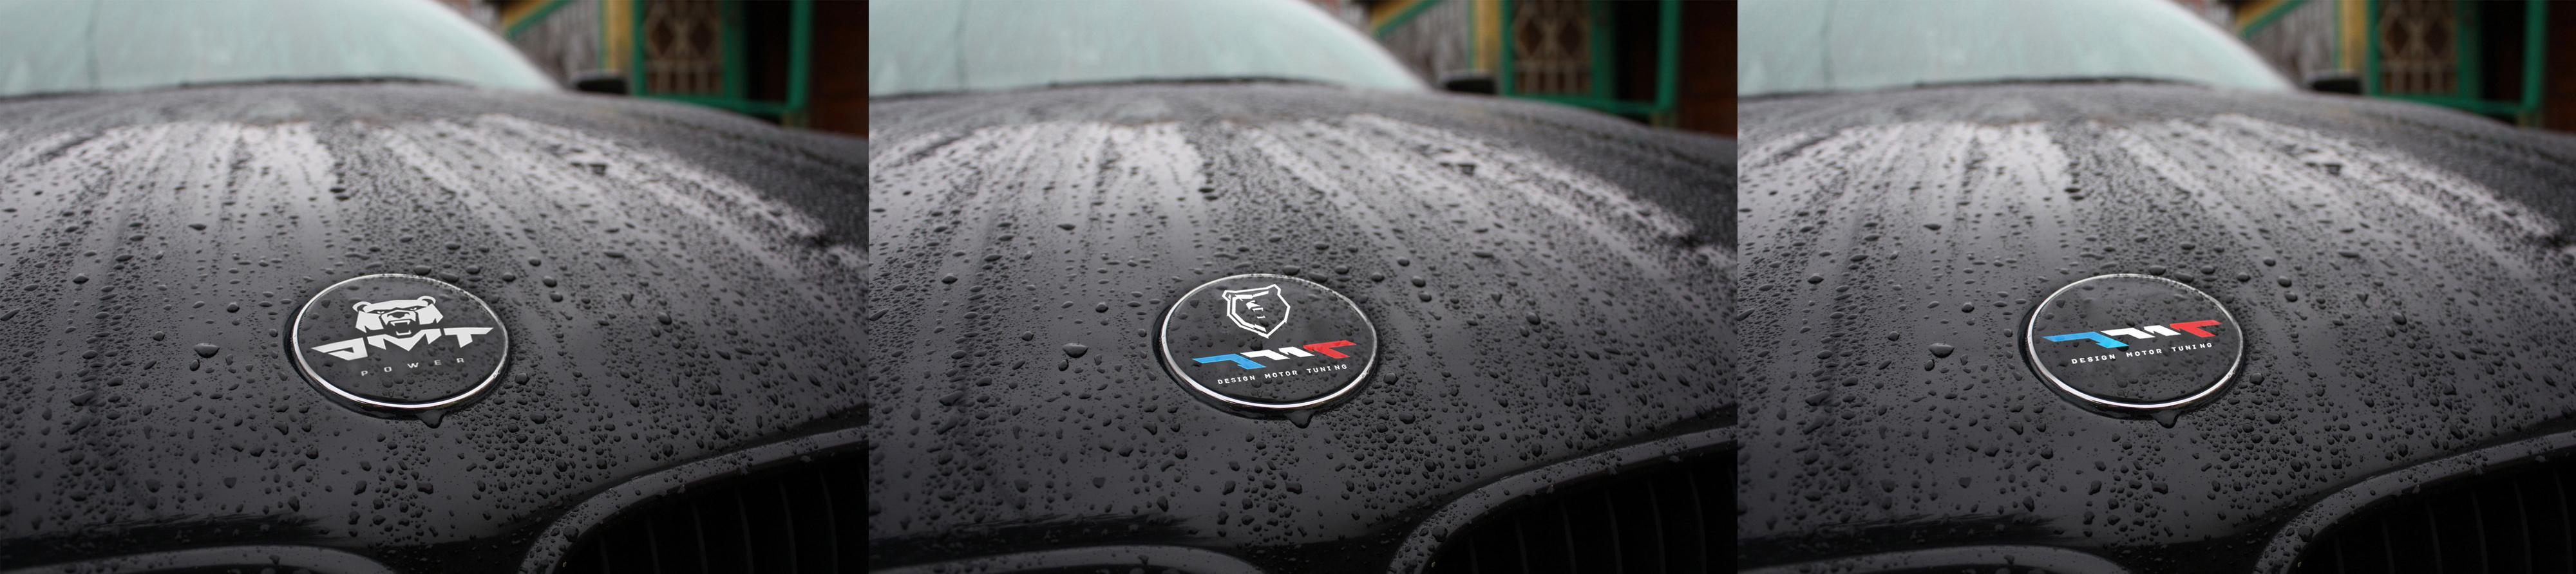 Логотип для Тюнинг Ателье фото f_511553edf05603e5.jpg